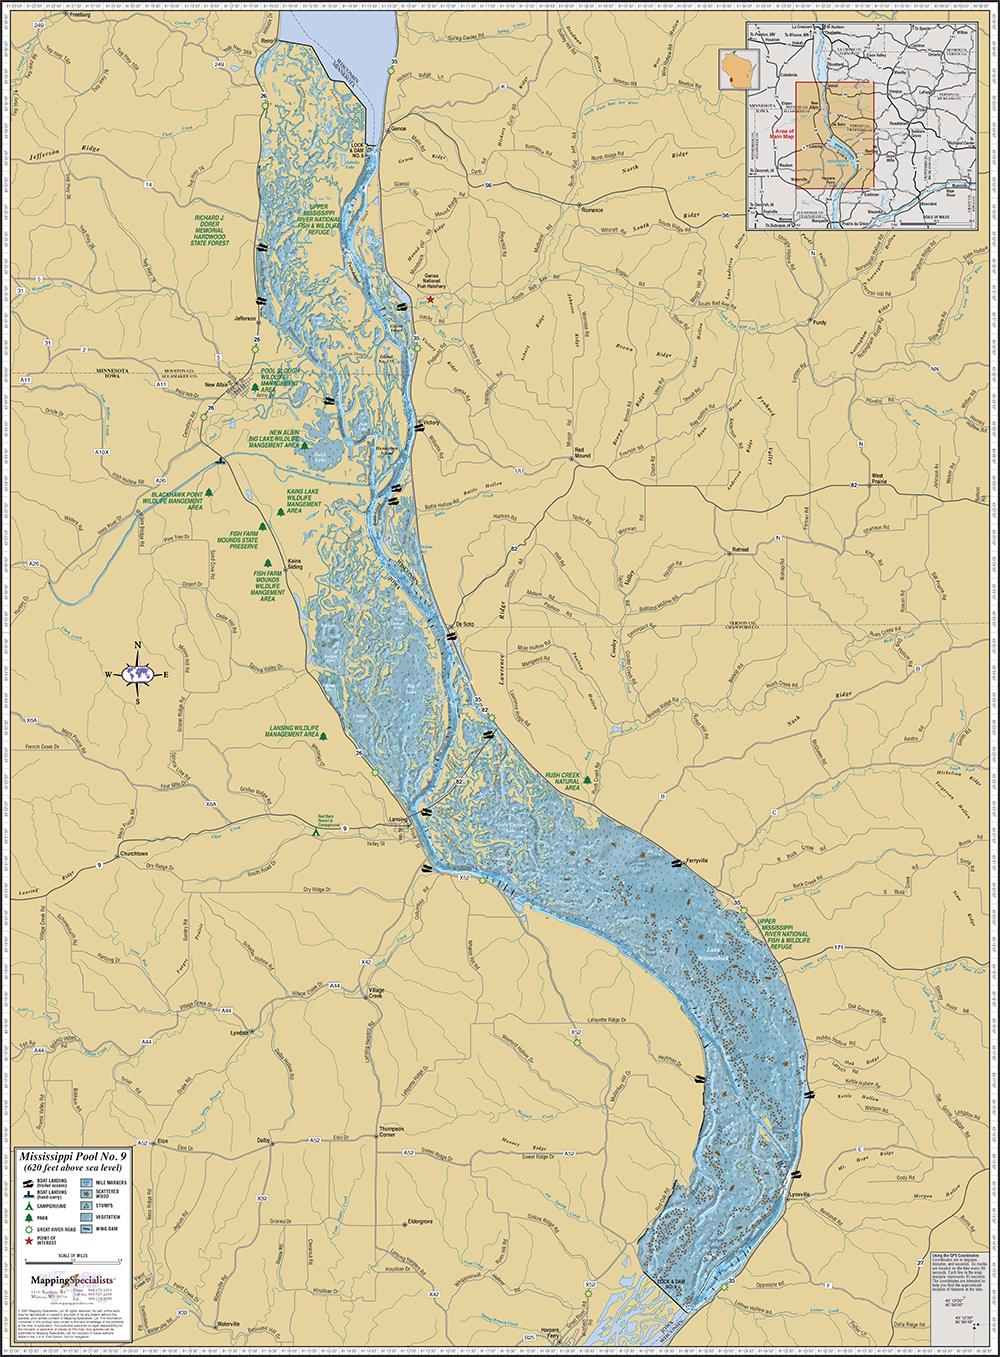 Map Of Mississippi River Mississippi River (Pool 9) Wall Map Map Of Mississippi River